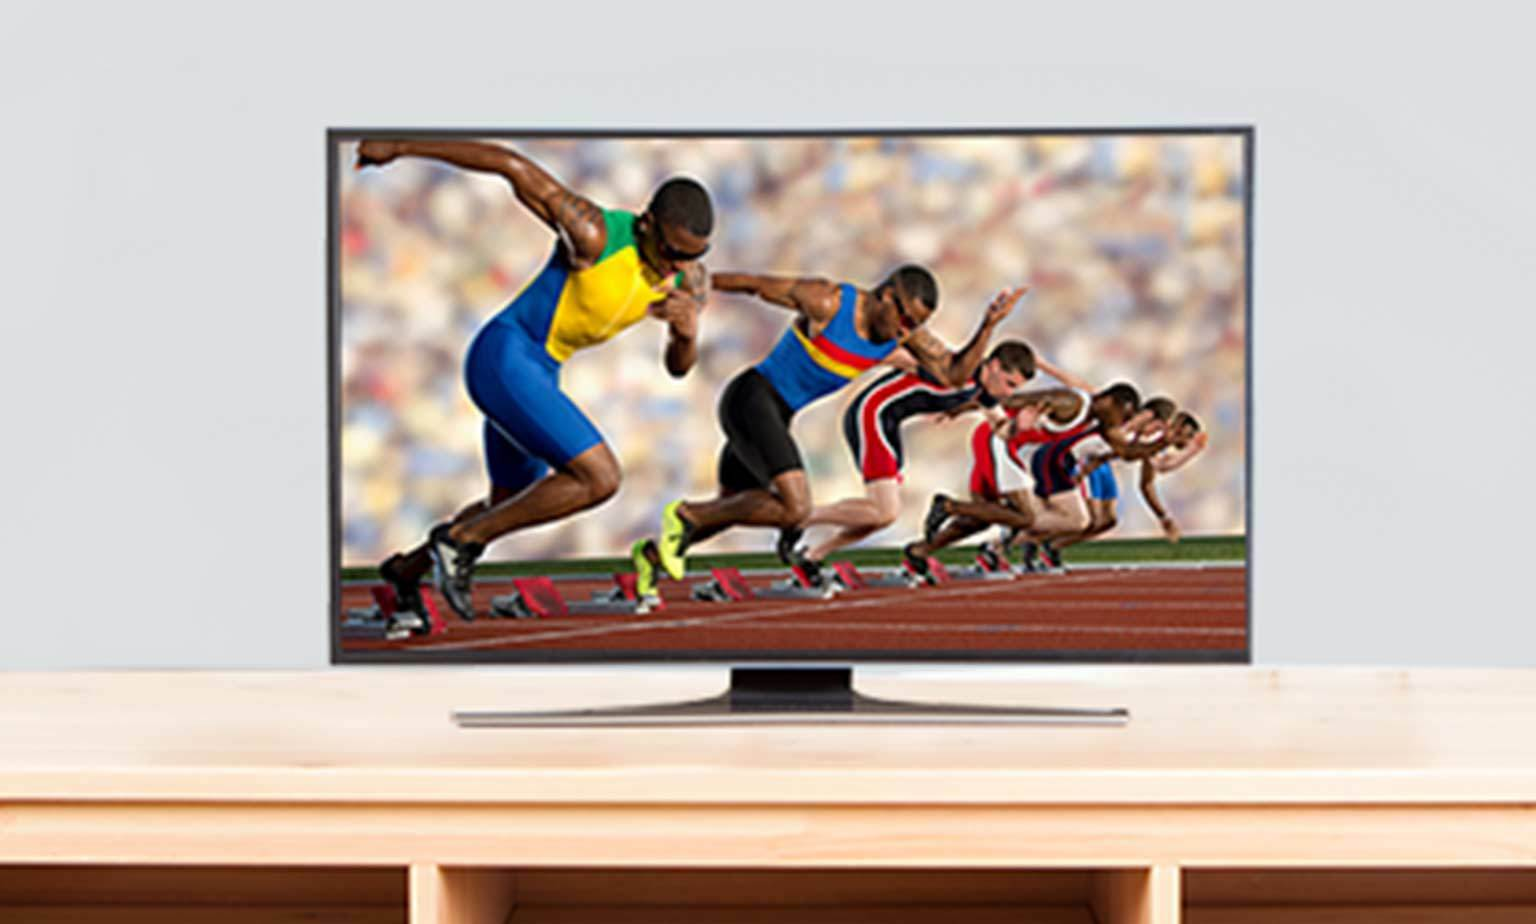 Top Selling TVs